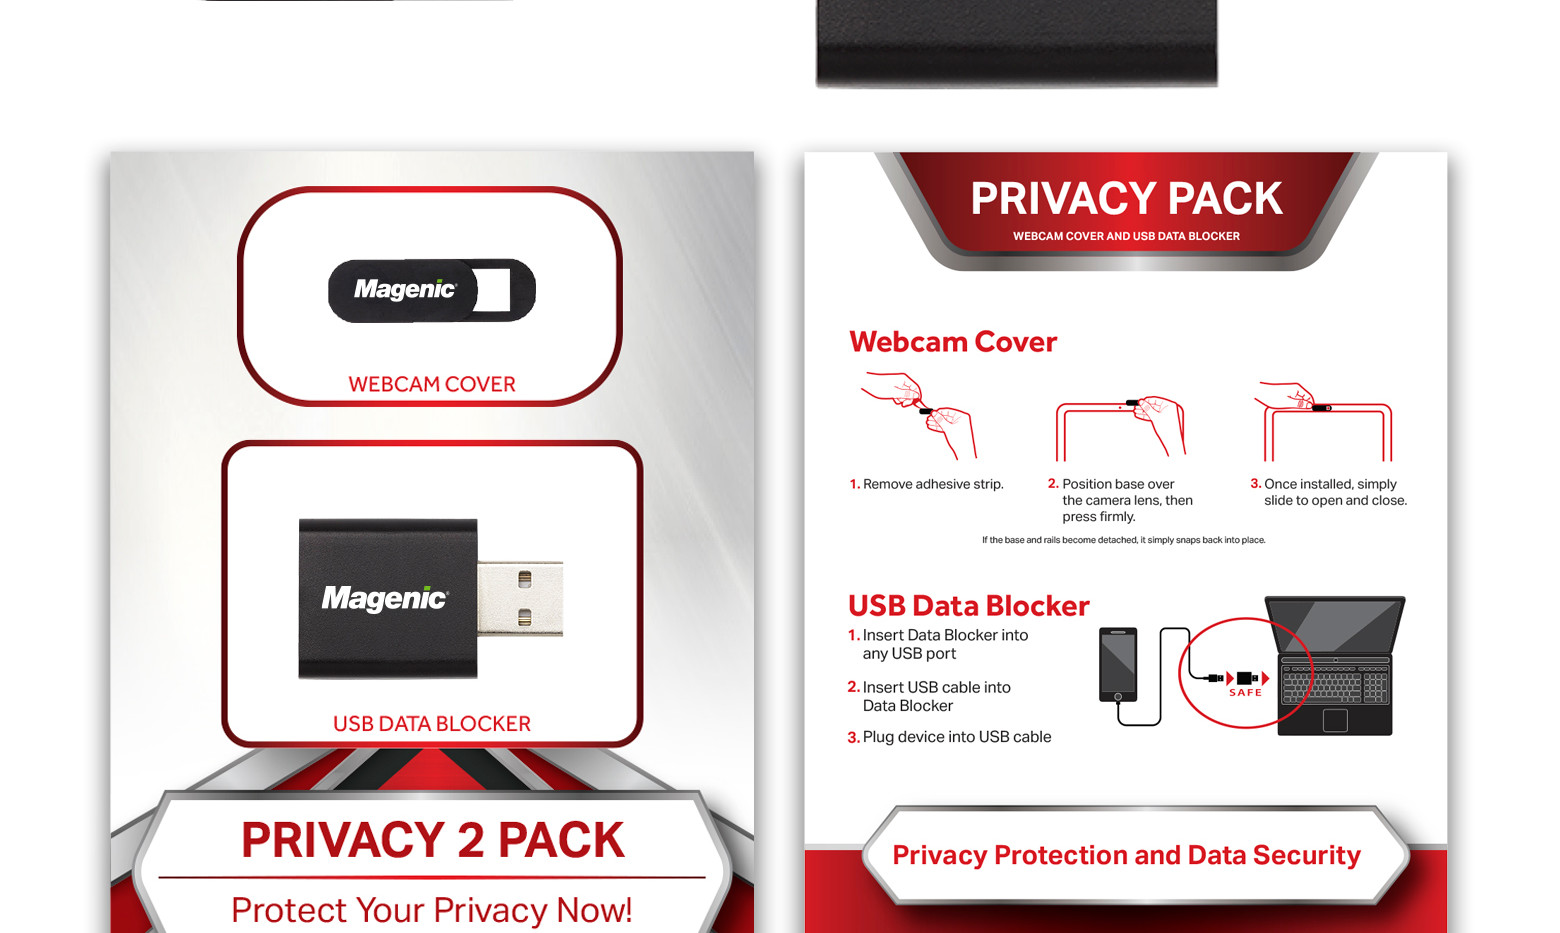 Magenic Privacy 2 Pack standard.jpg